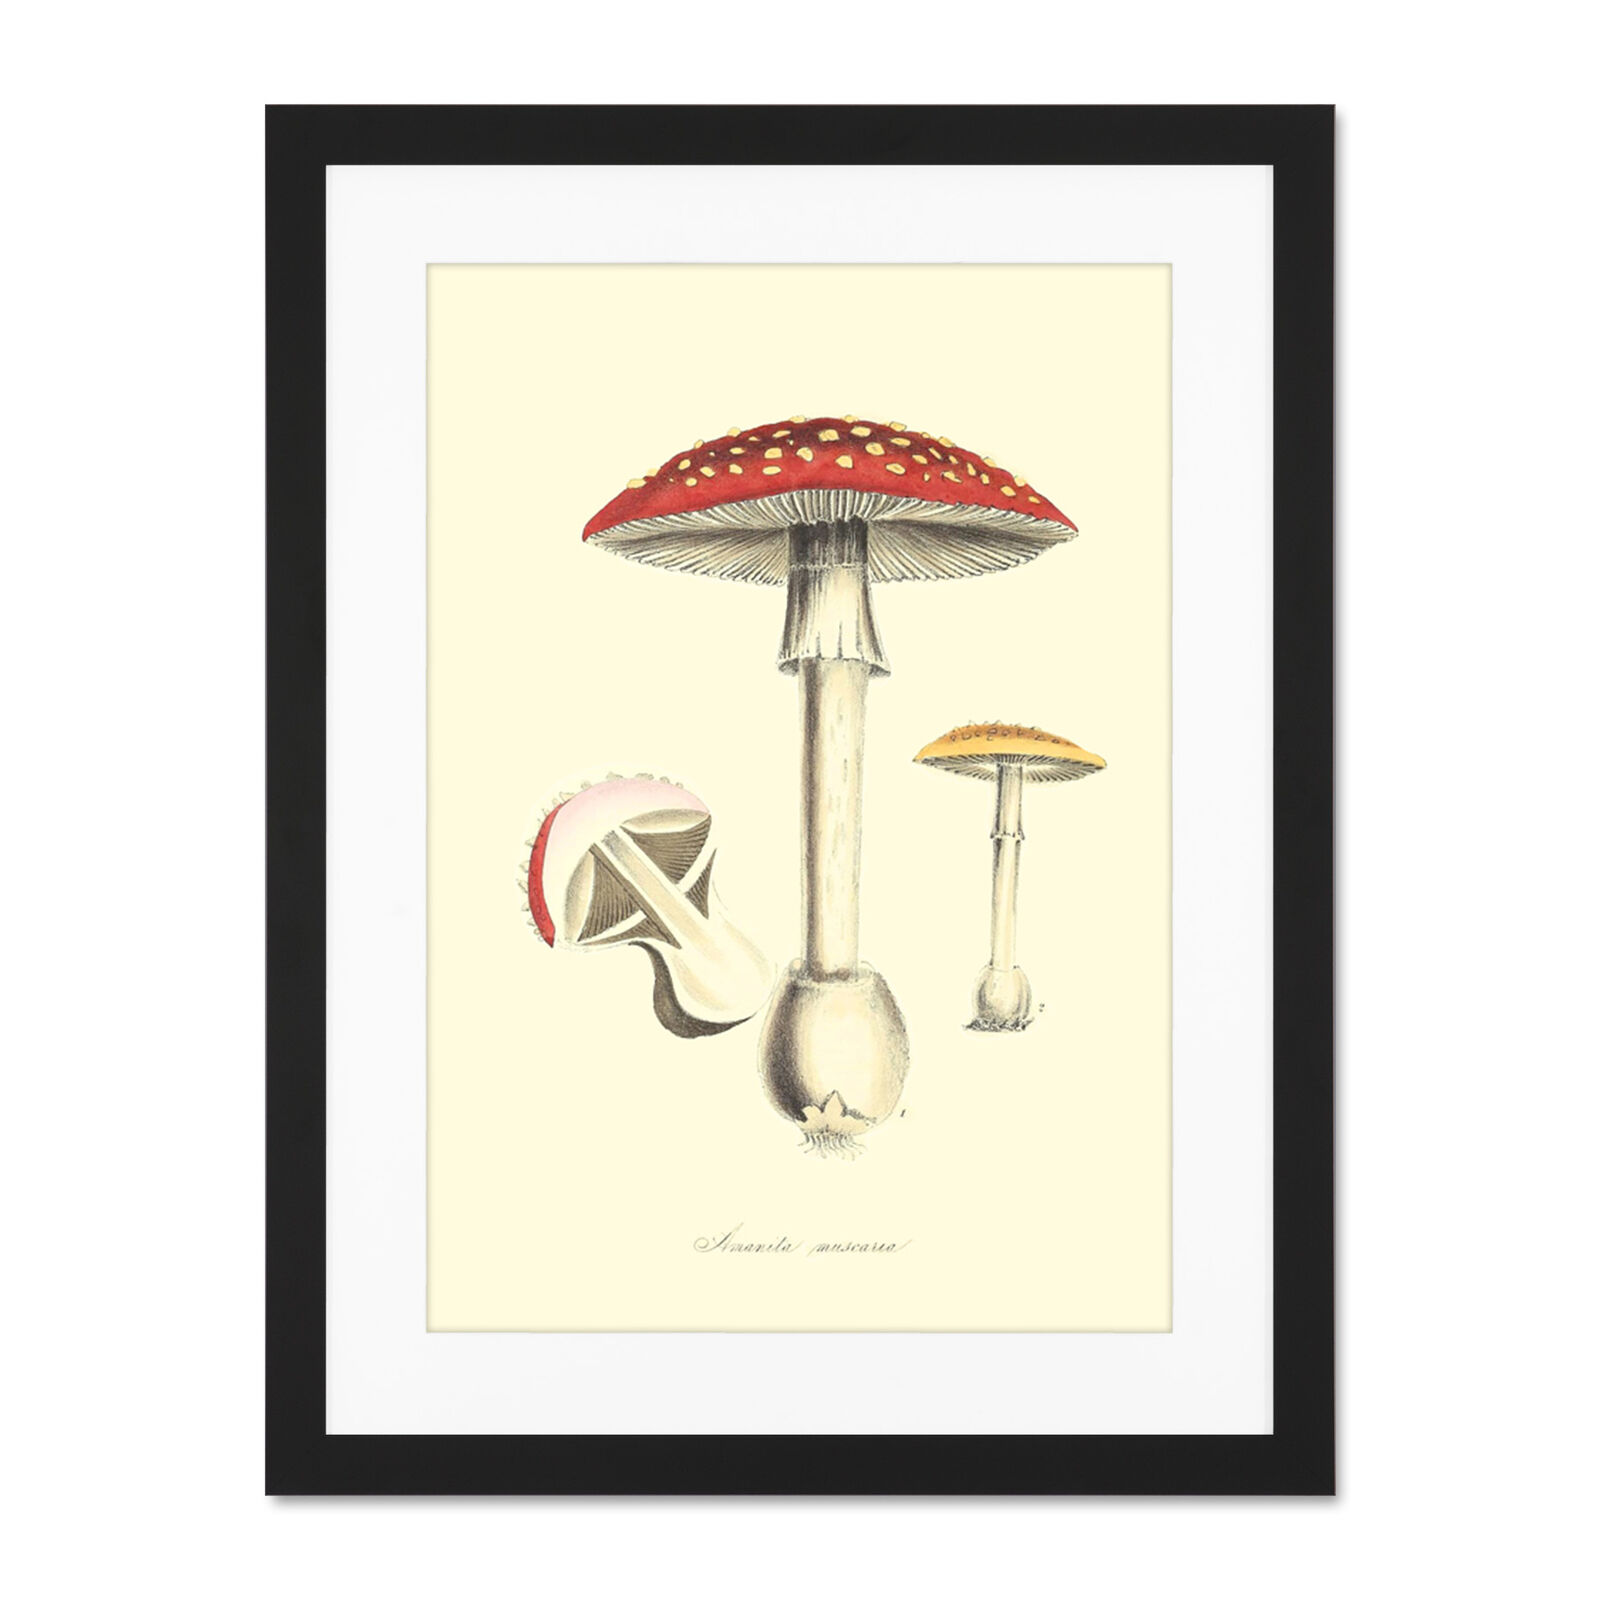 Fungus Amanita Muscaria Fly Agaric Magic Mushroom Large Framed Kunst Drucken Poster